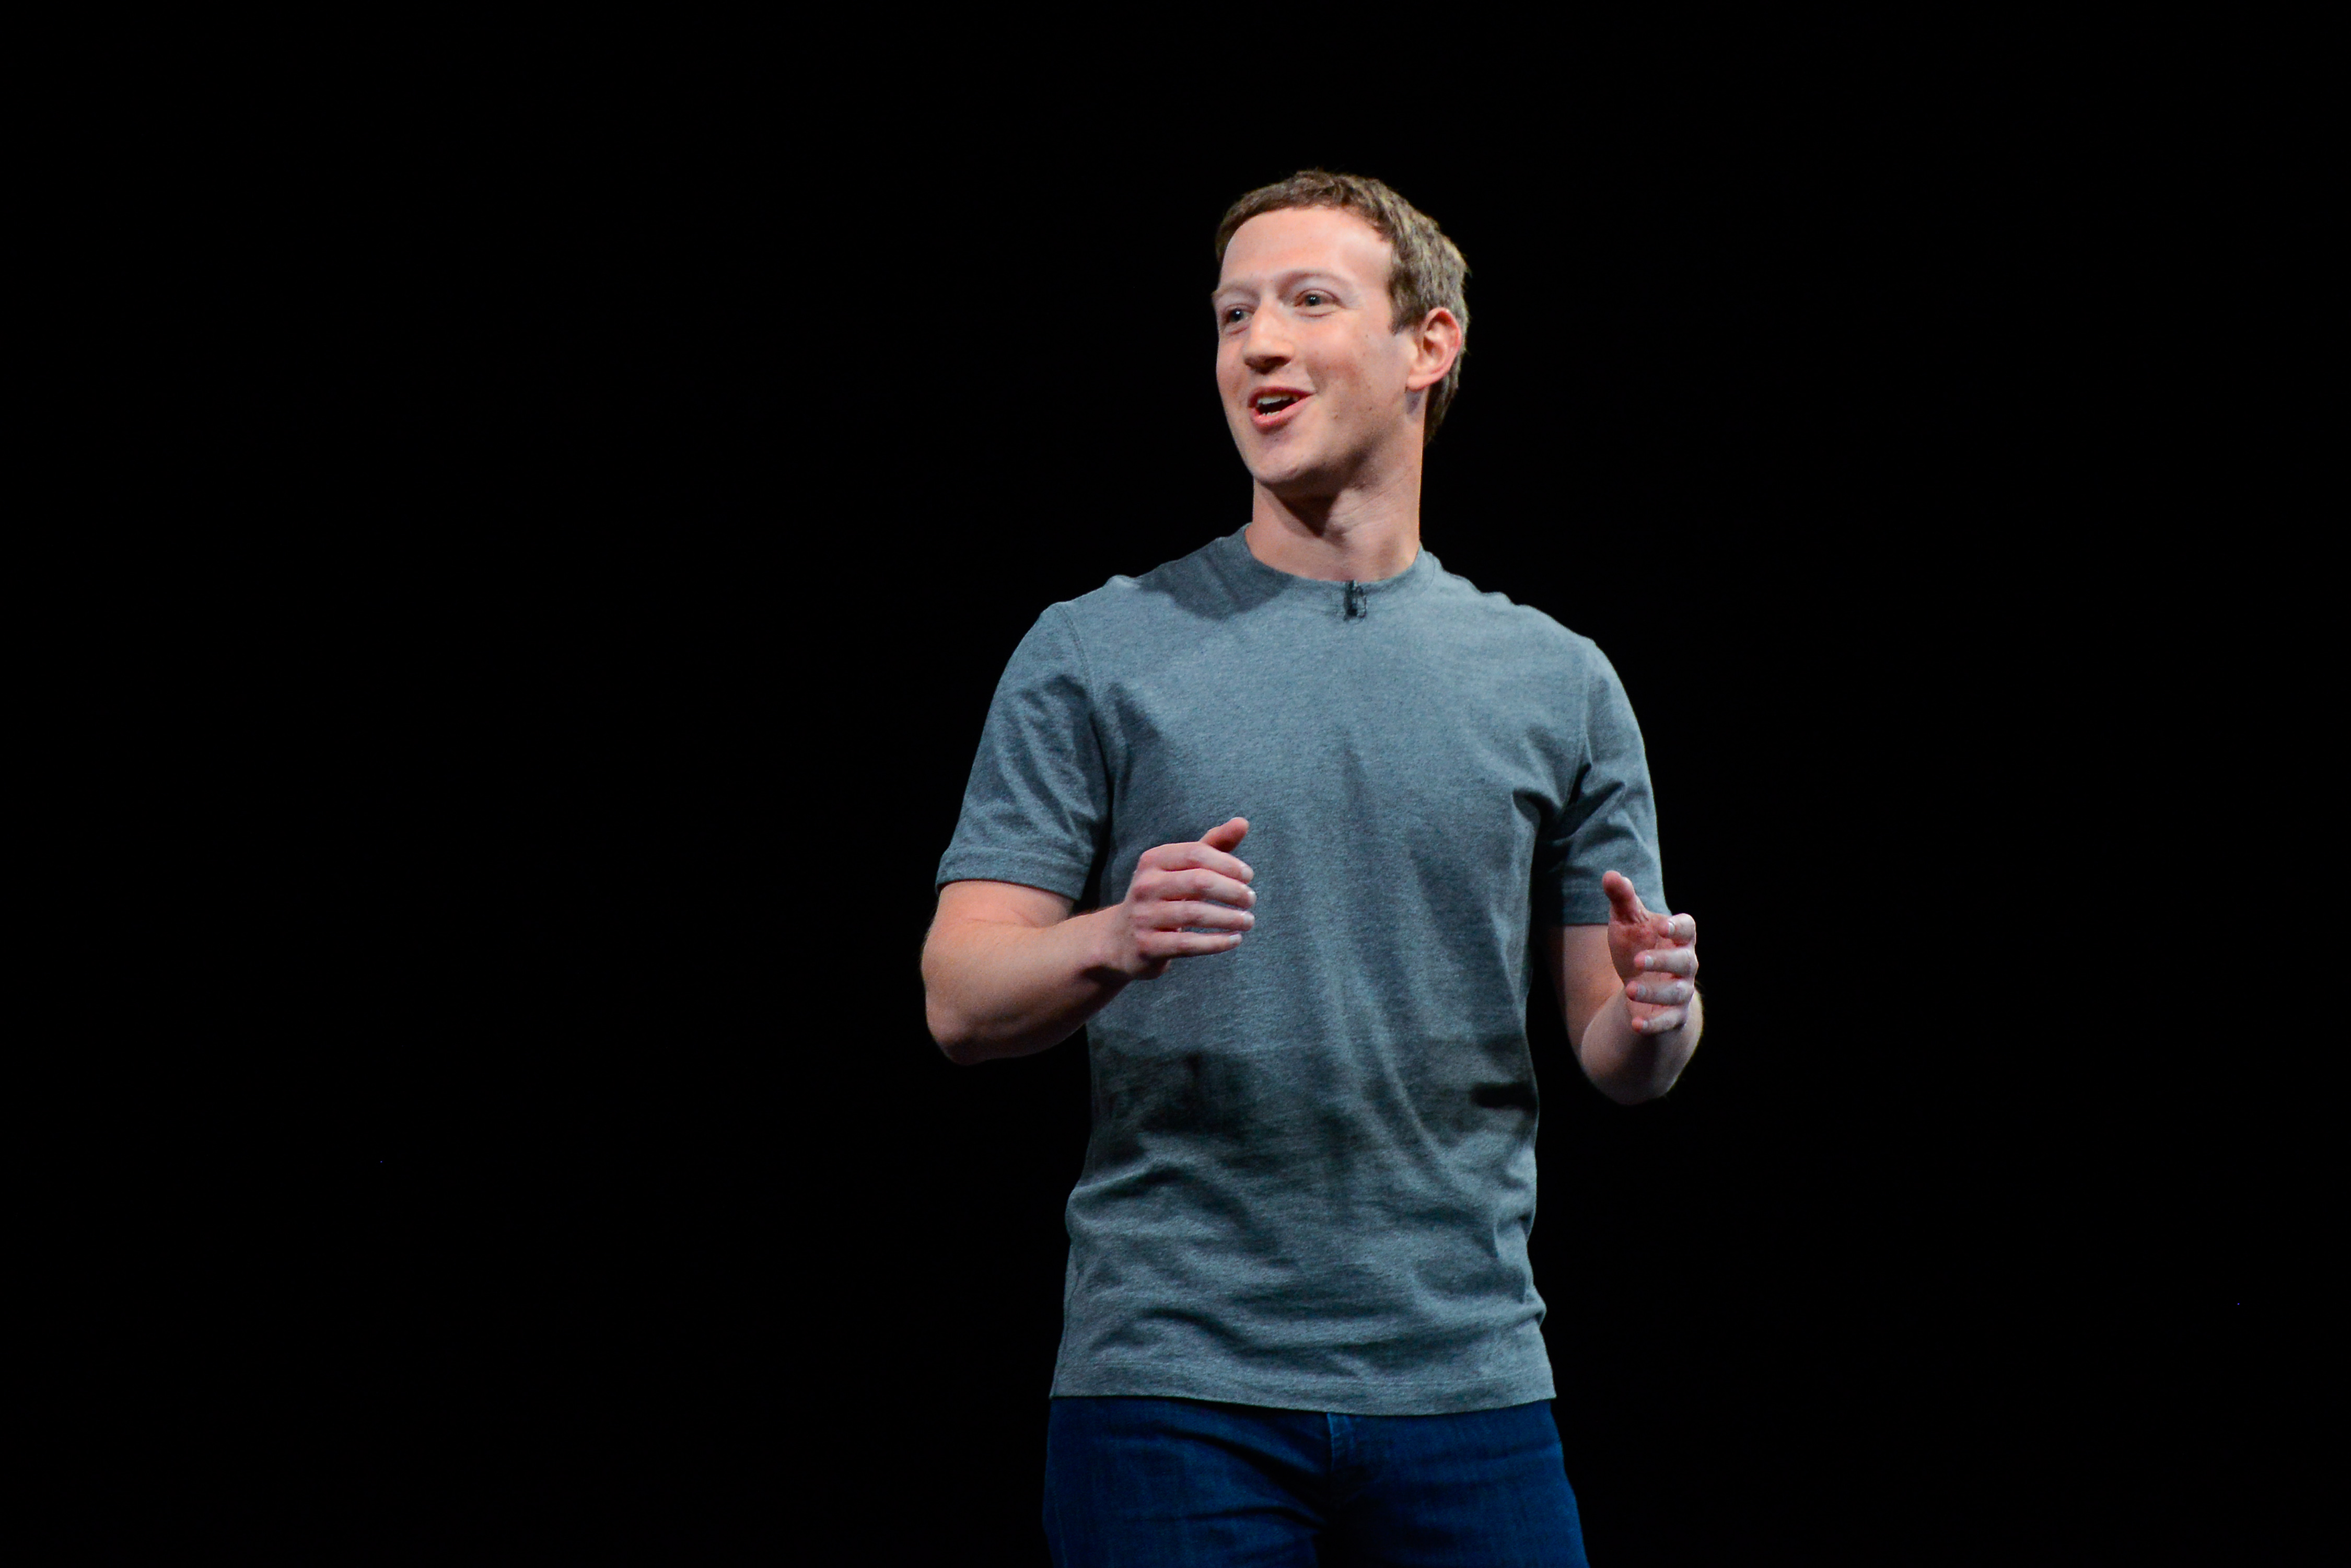 Founder and CEO of Facebook Mark Zuckerberg giving a speech.